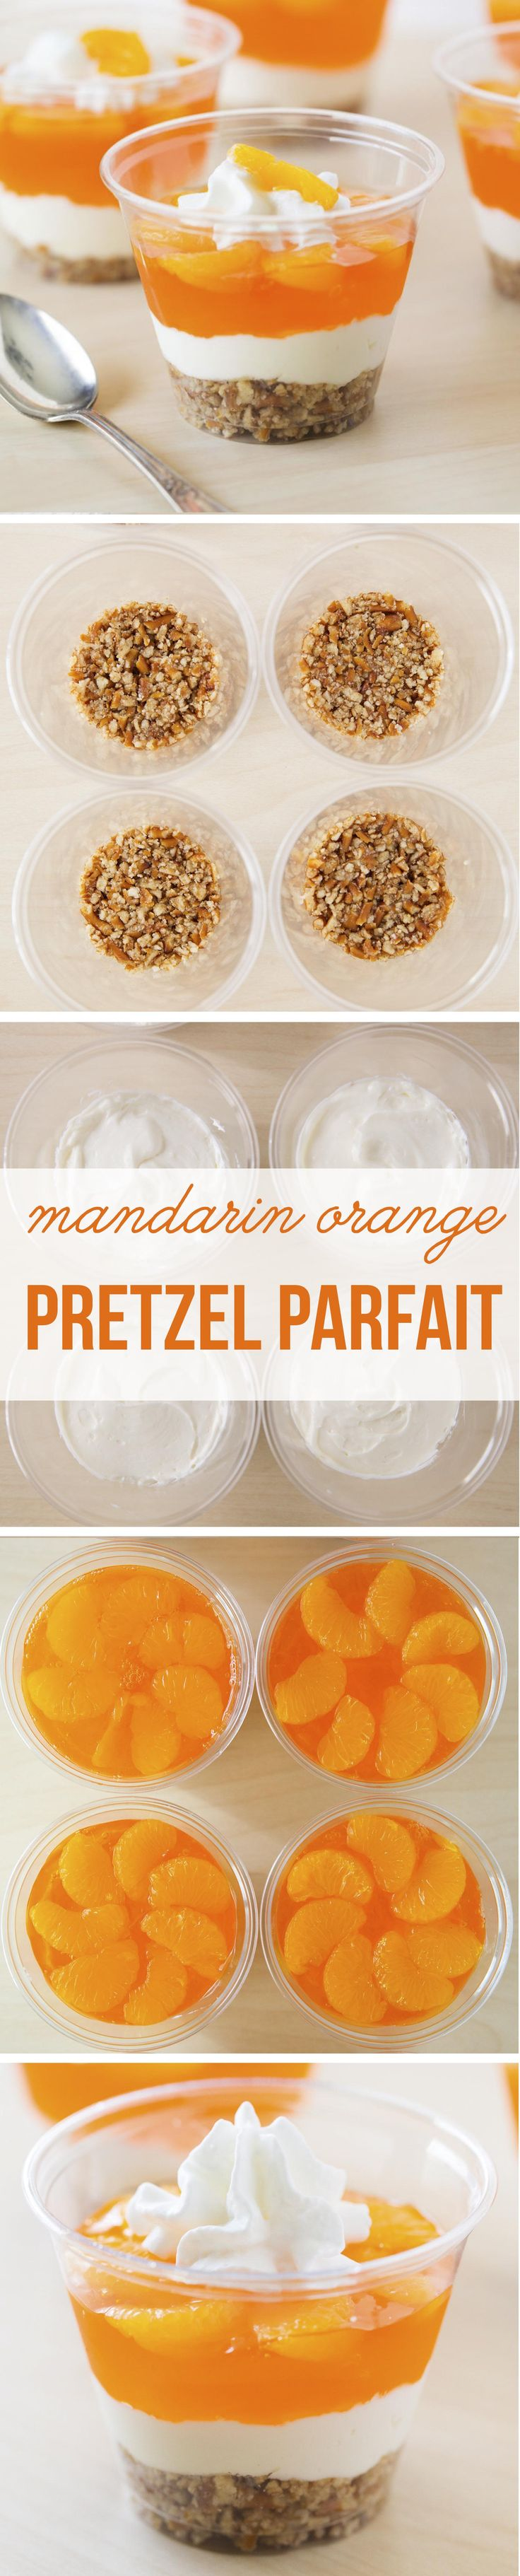 Easy no-bake mandarin orange pretzel parfaits made with Dole mandarin oranges a pretzel crust and cheesecake filling!